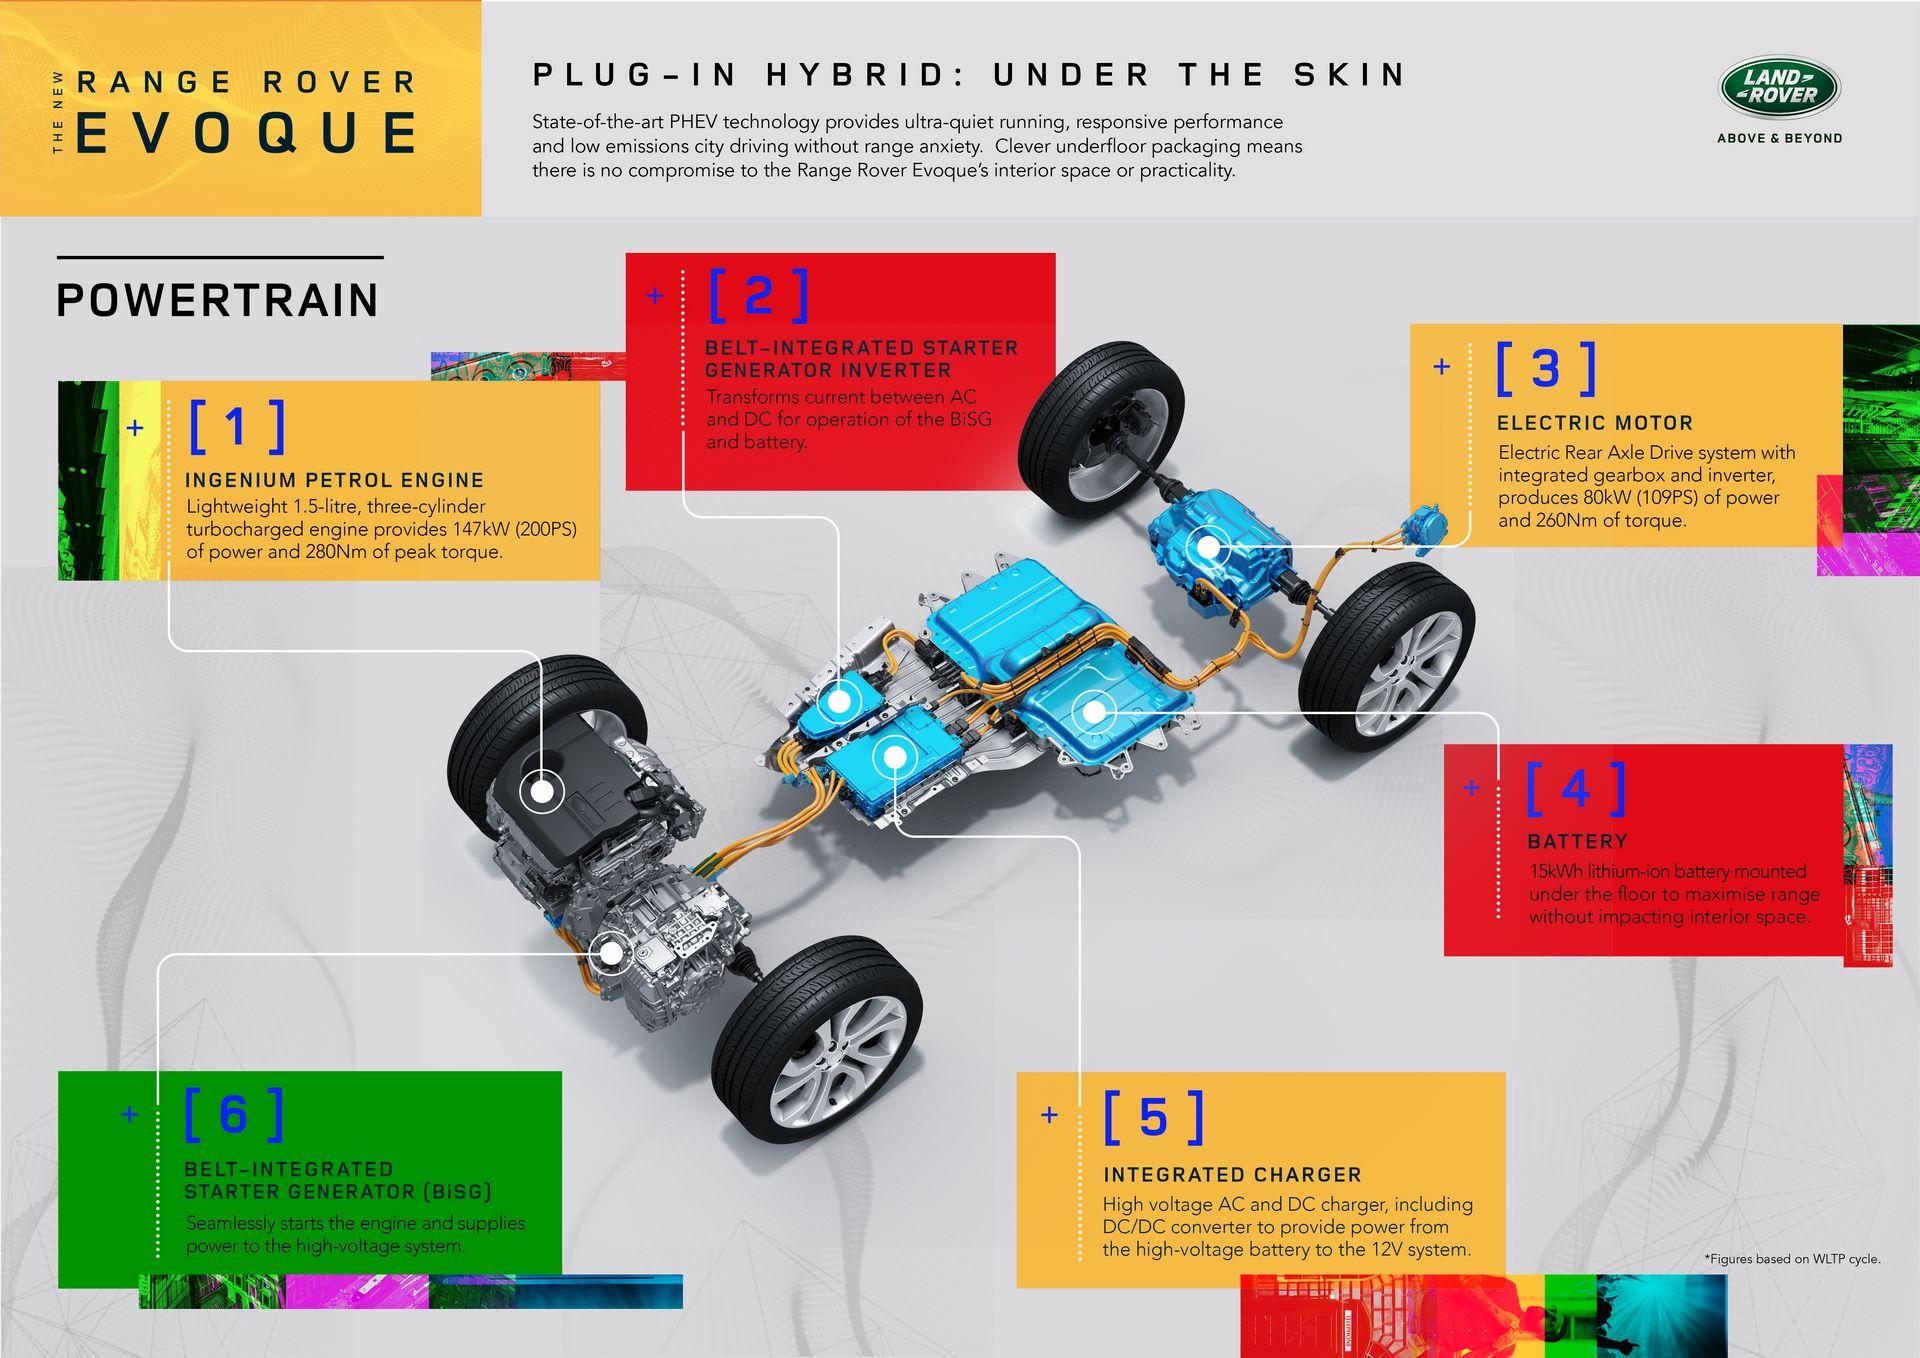 Plug-in-hybrid-Rabge-Rover-Evoque-PHEV-20